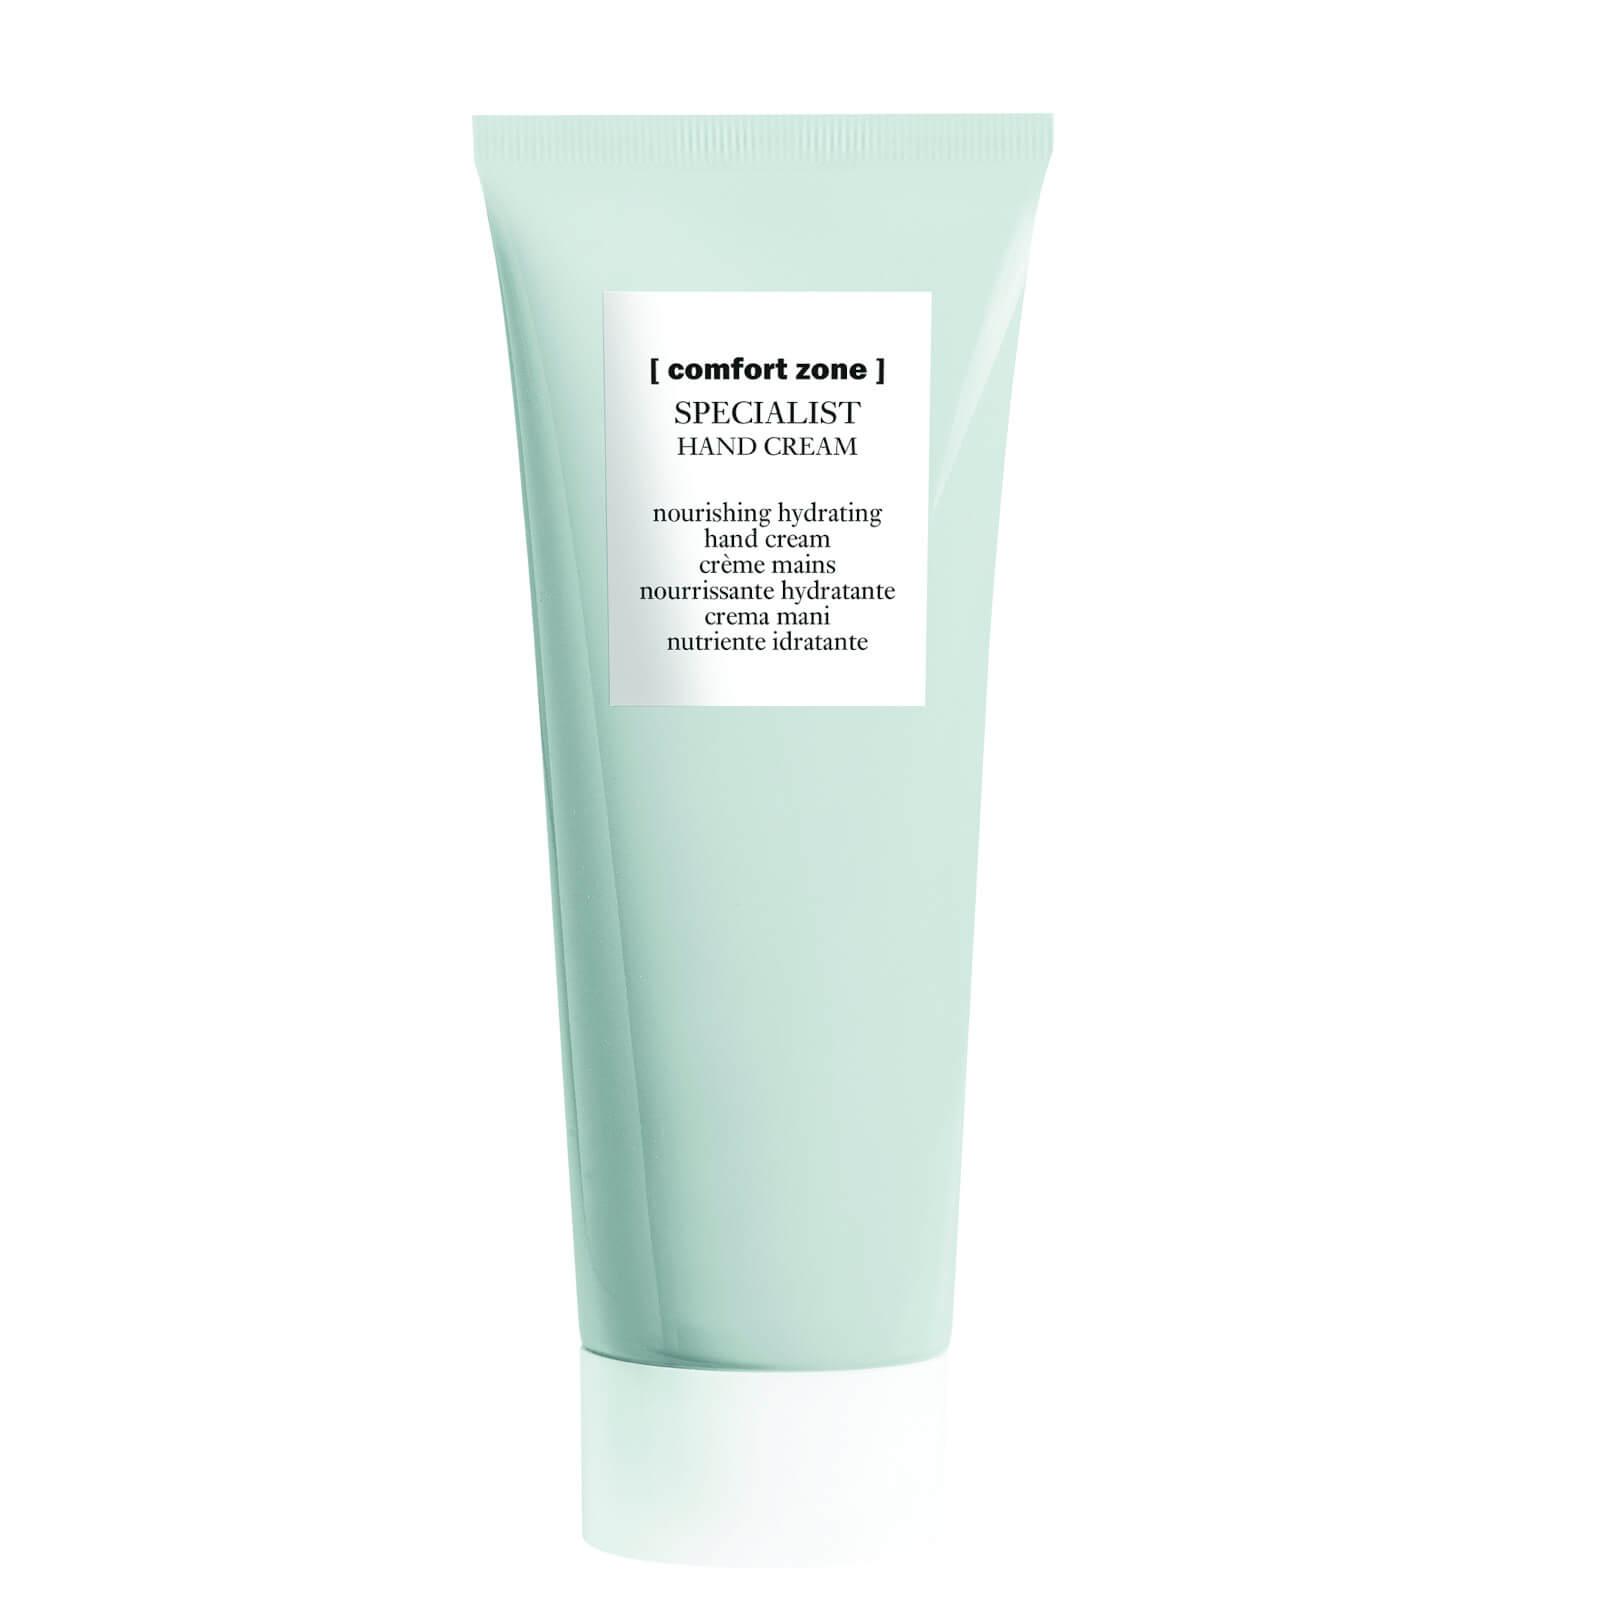 Comfort Zone Specialist Hand Cream 100g